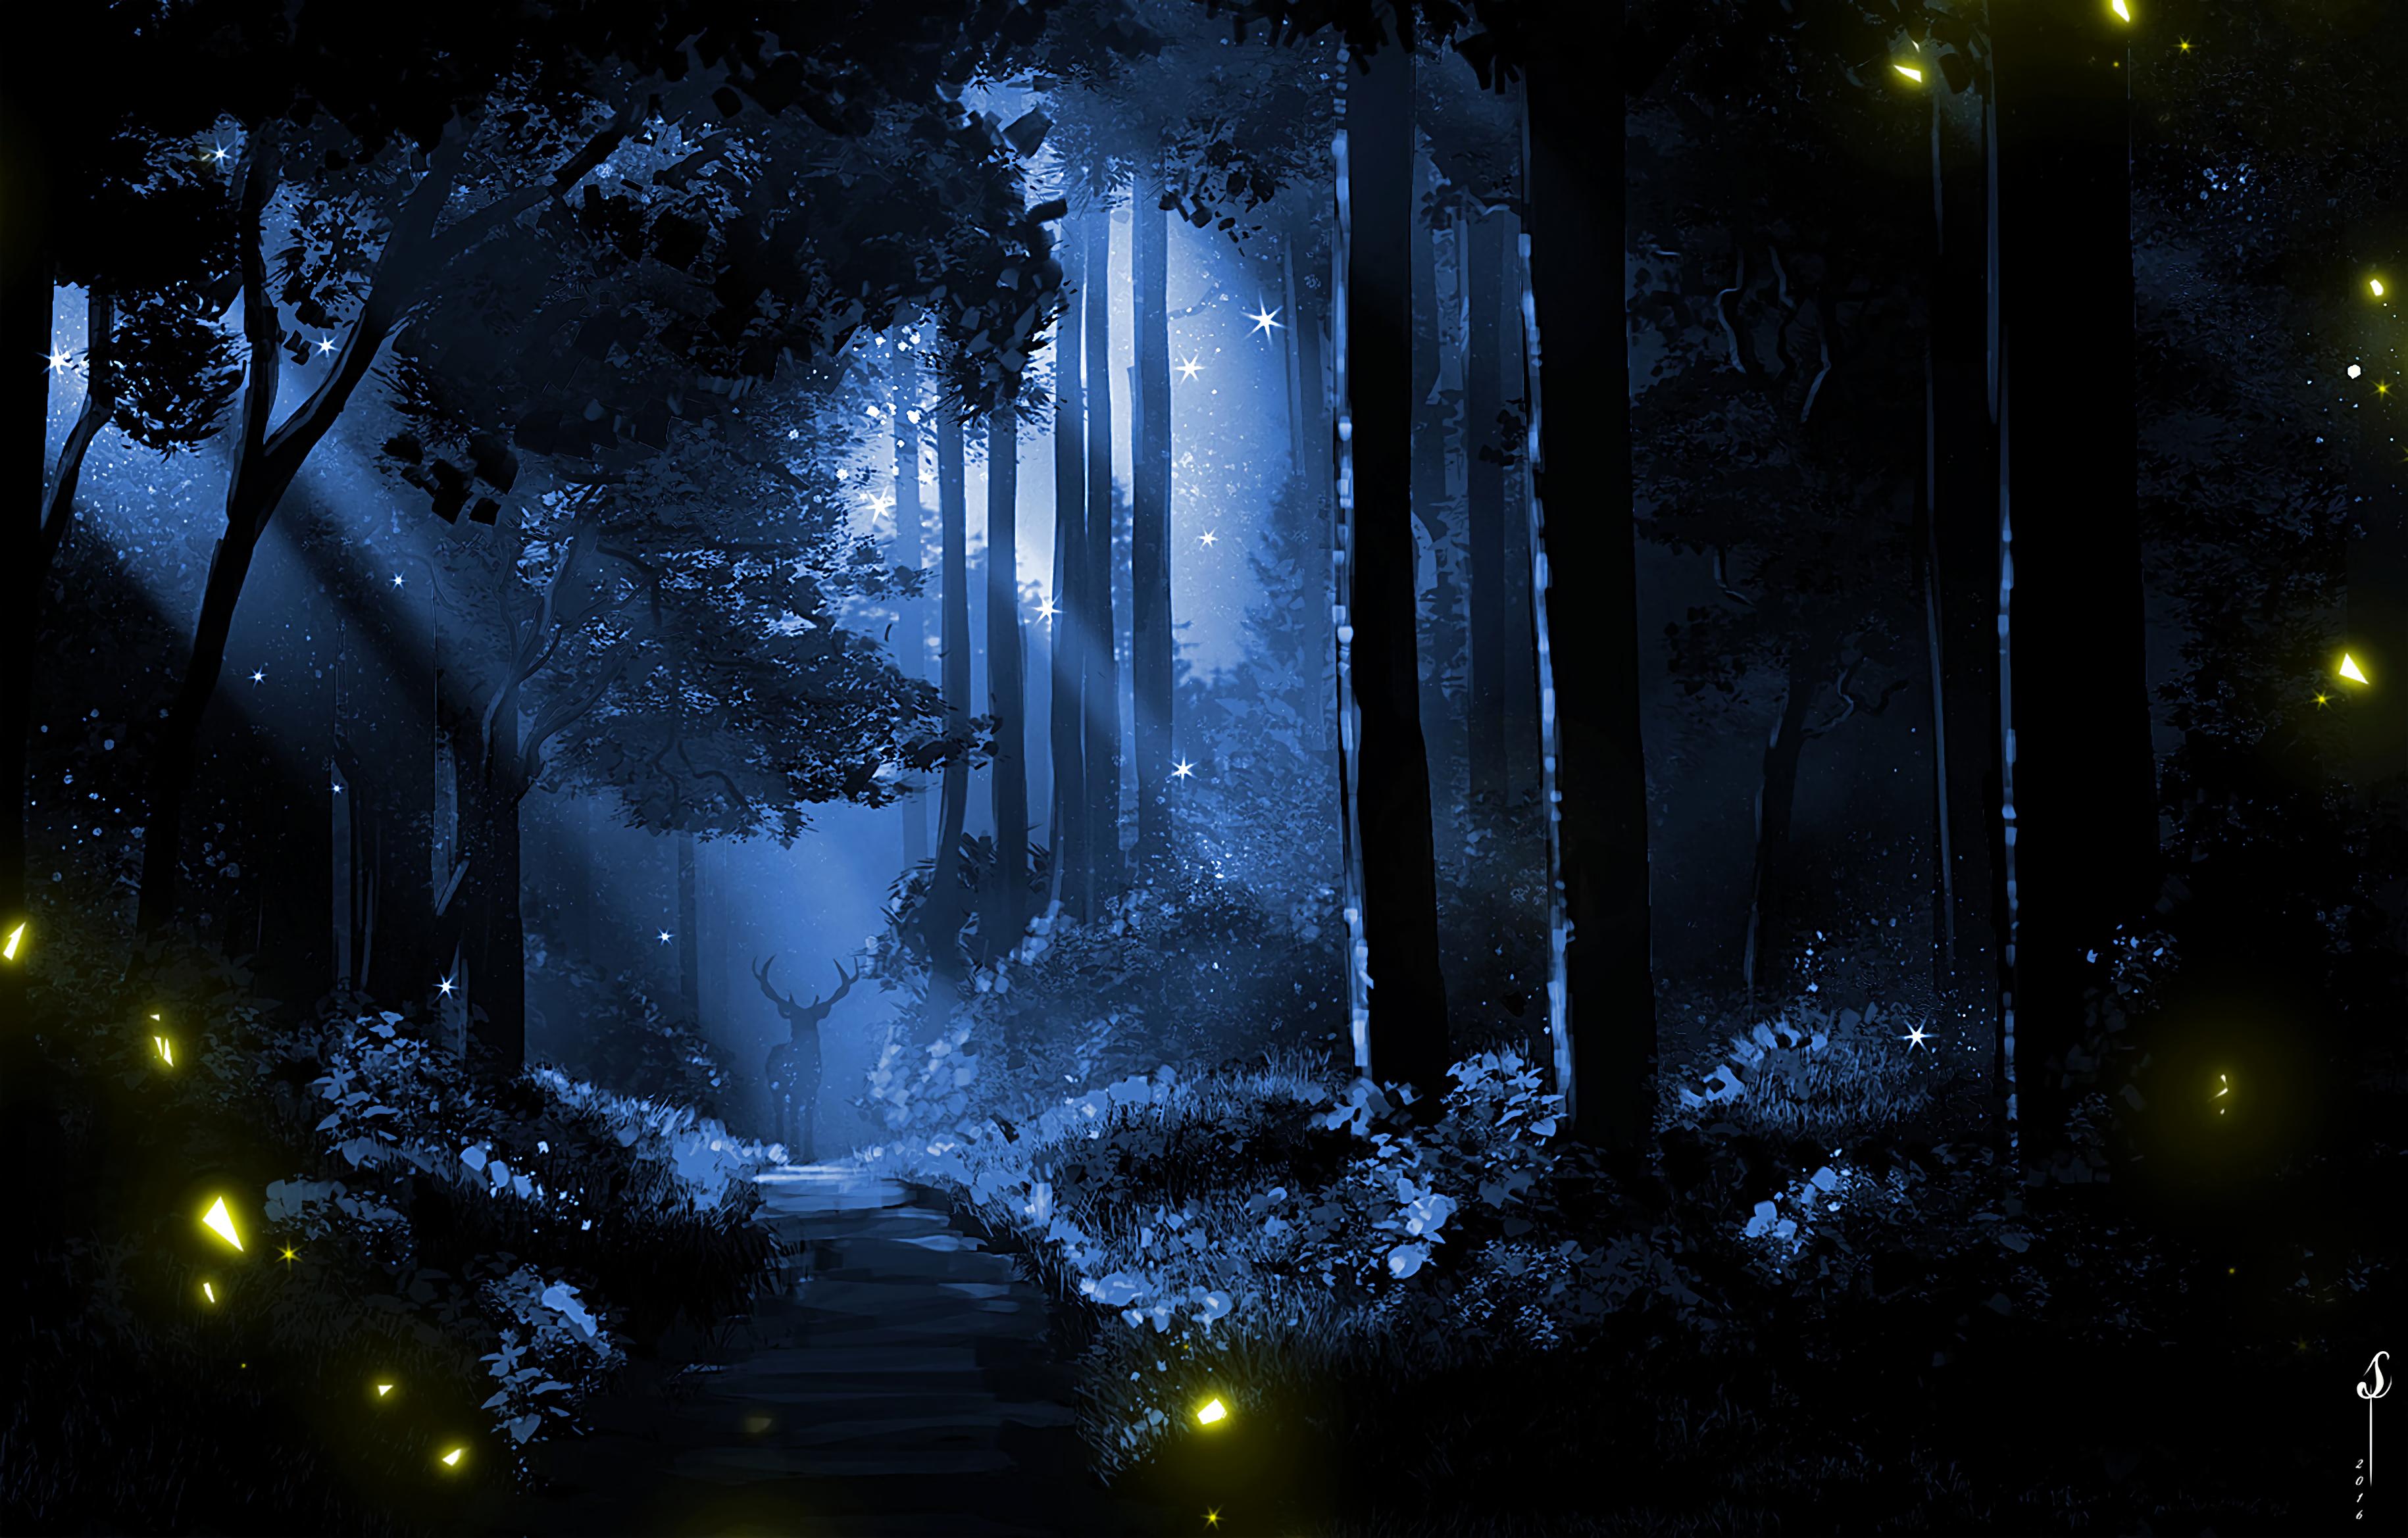 General 3660x2338 digital digital art artwork forest nature lights night night view moon rays wood landscape dark silhouette trees